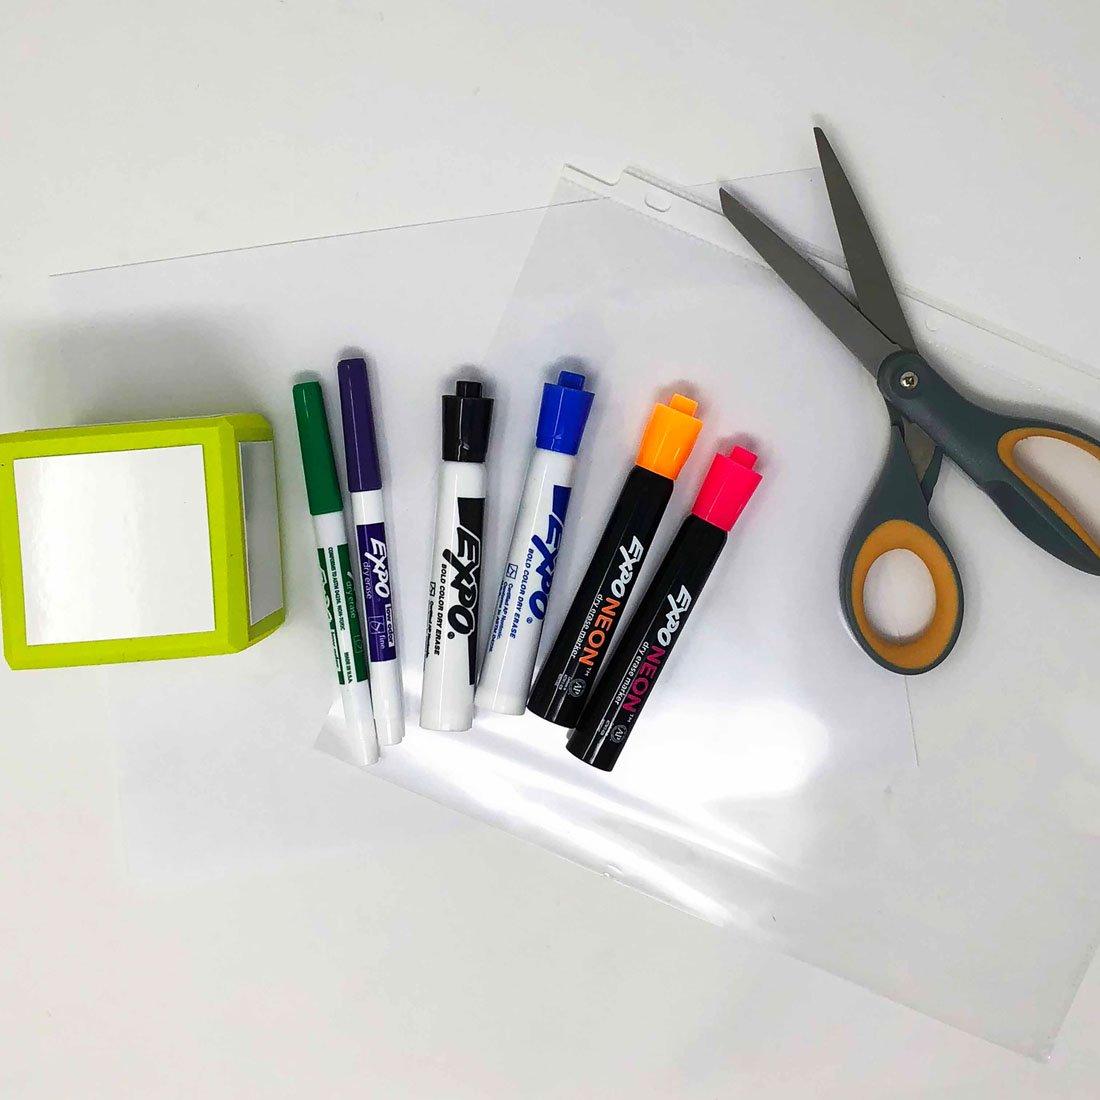 supplies-needed-to-create-dry-erase-dice.jpg